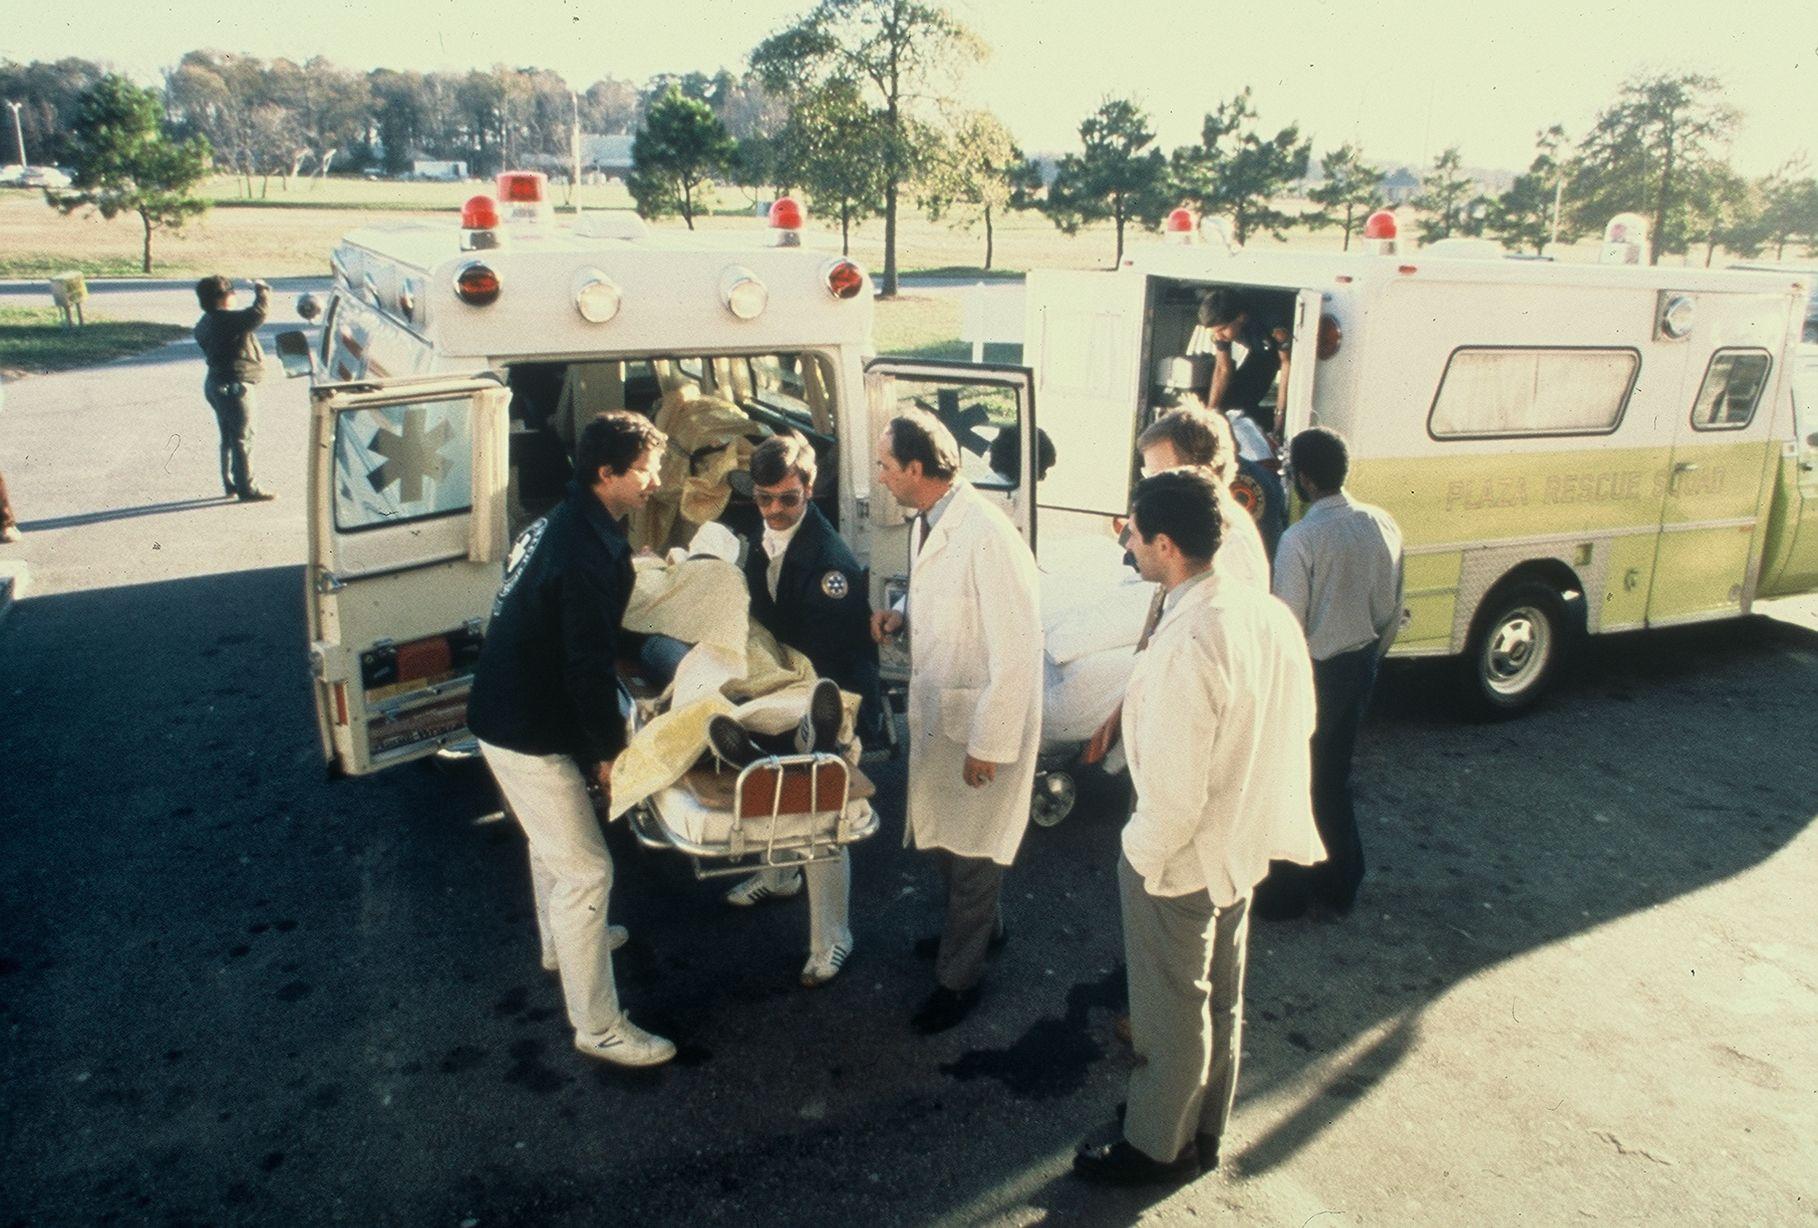 Virginia Beach Ems Van Ambulance Emergency Medical Beach Fire Emergency Medical Services